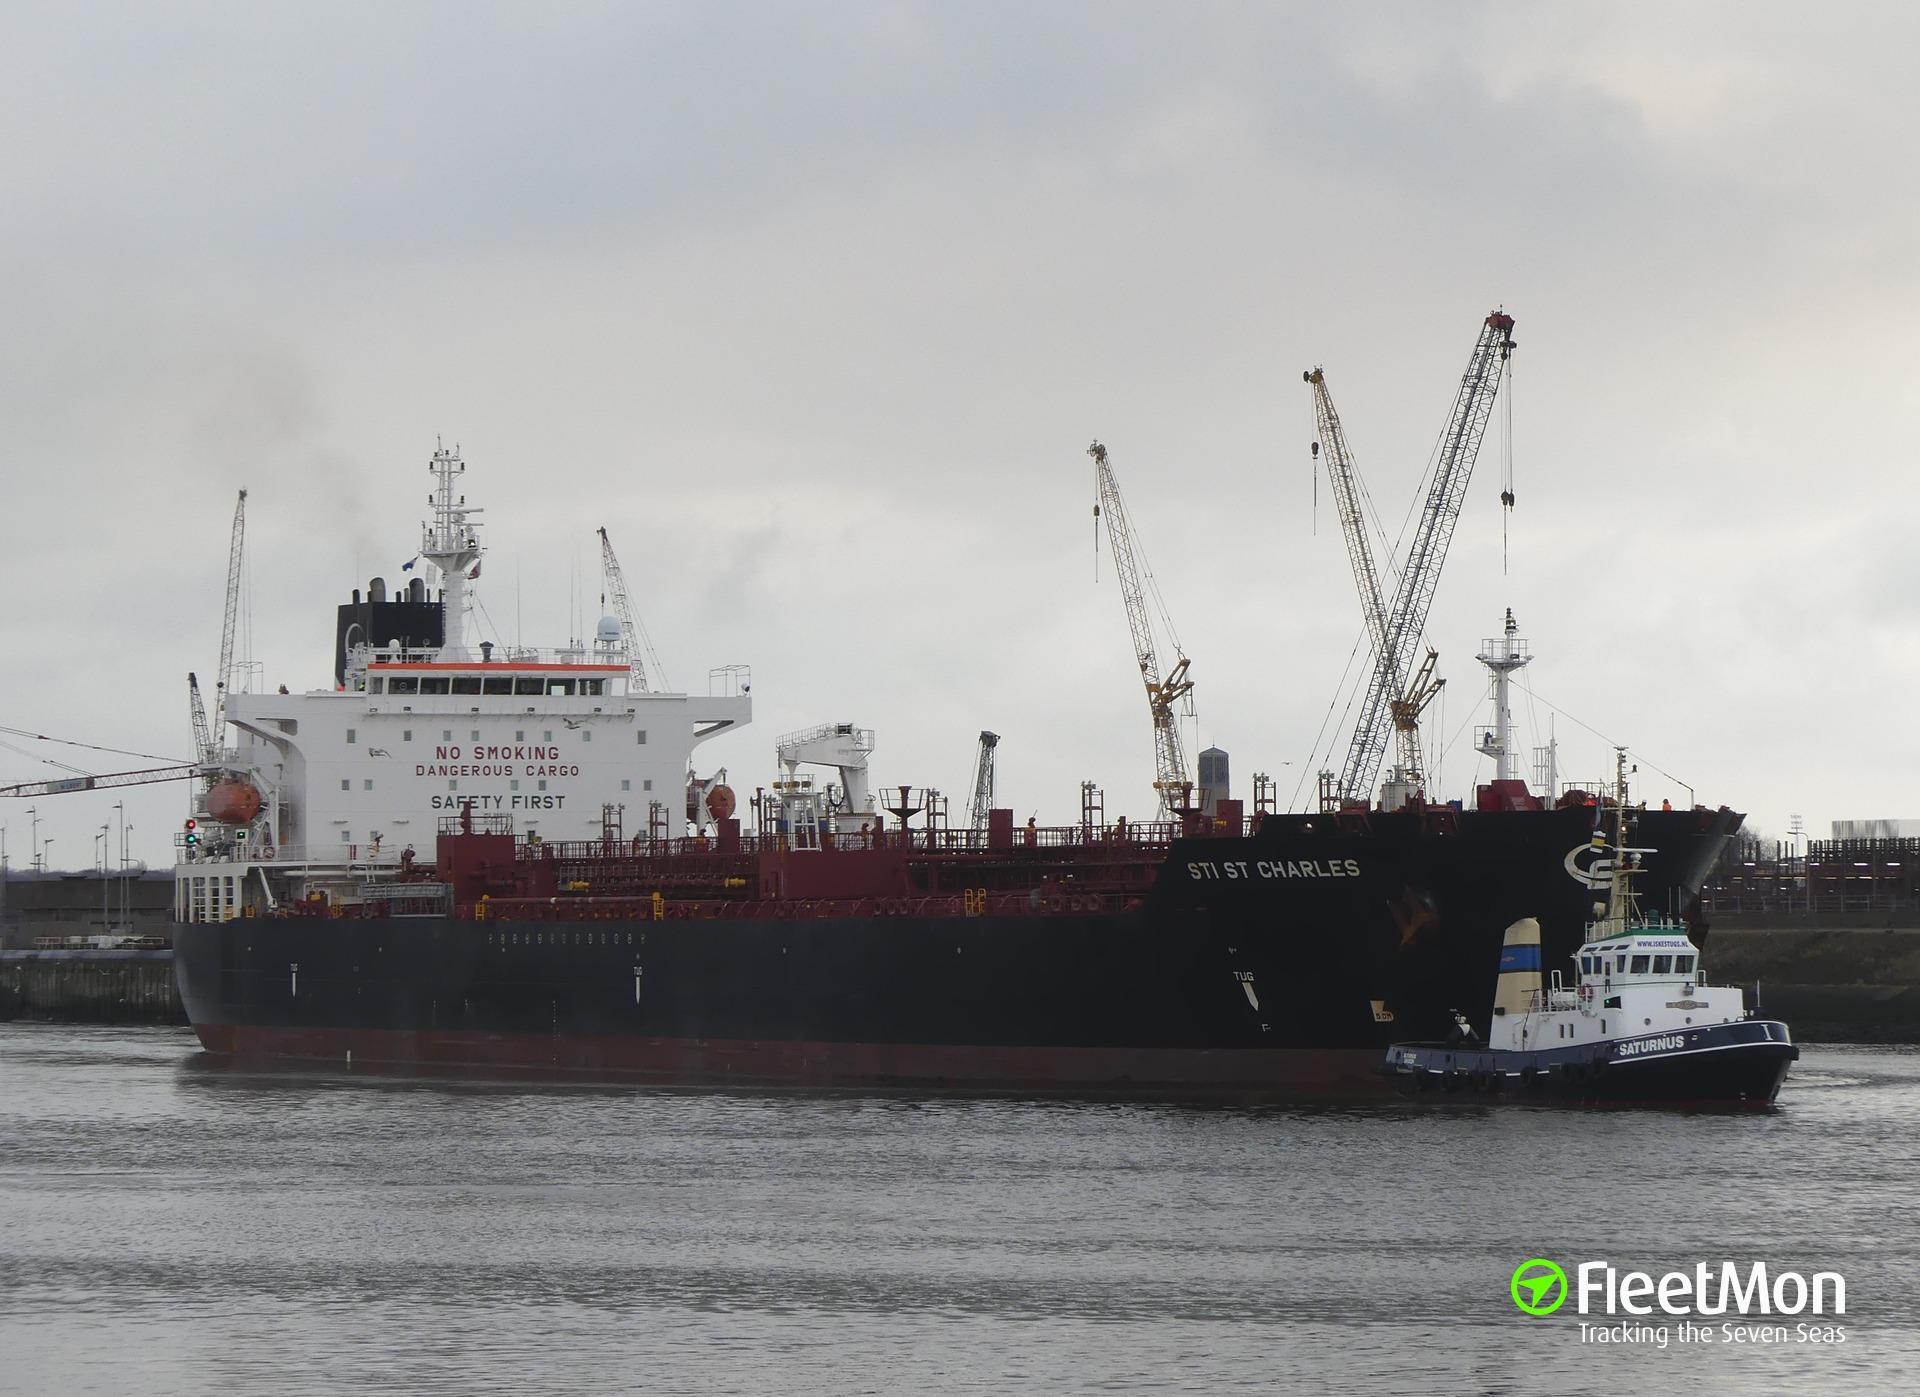 Product tanker STI ST CHARLES grounding